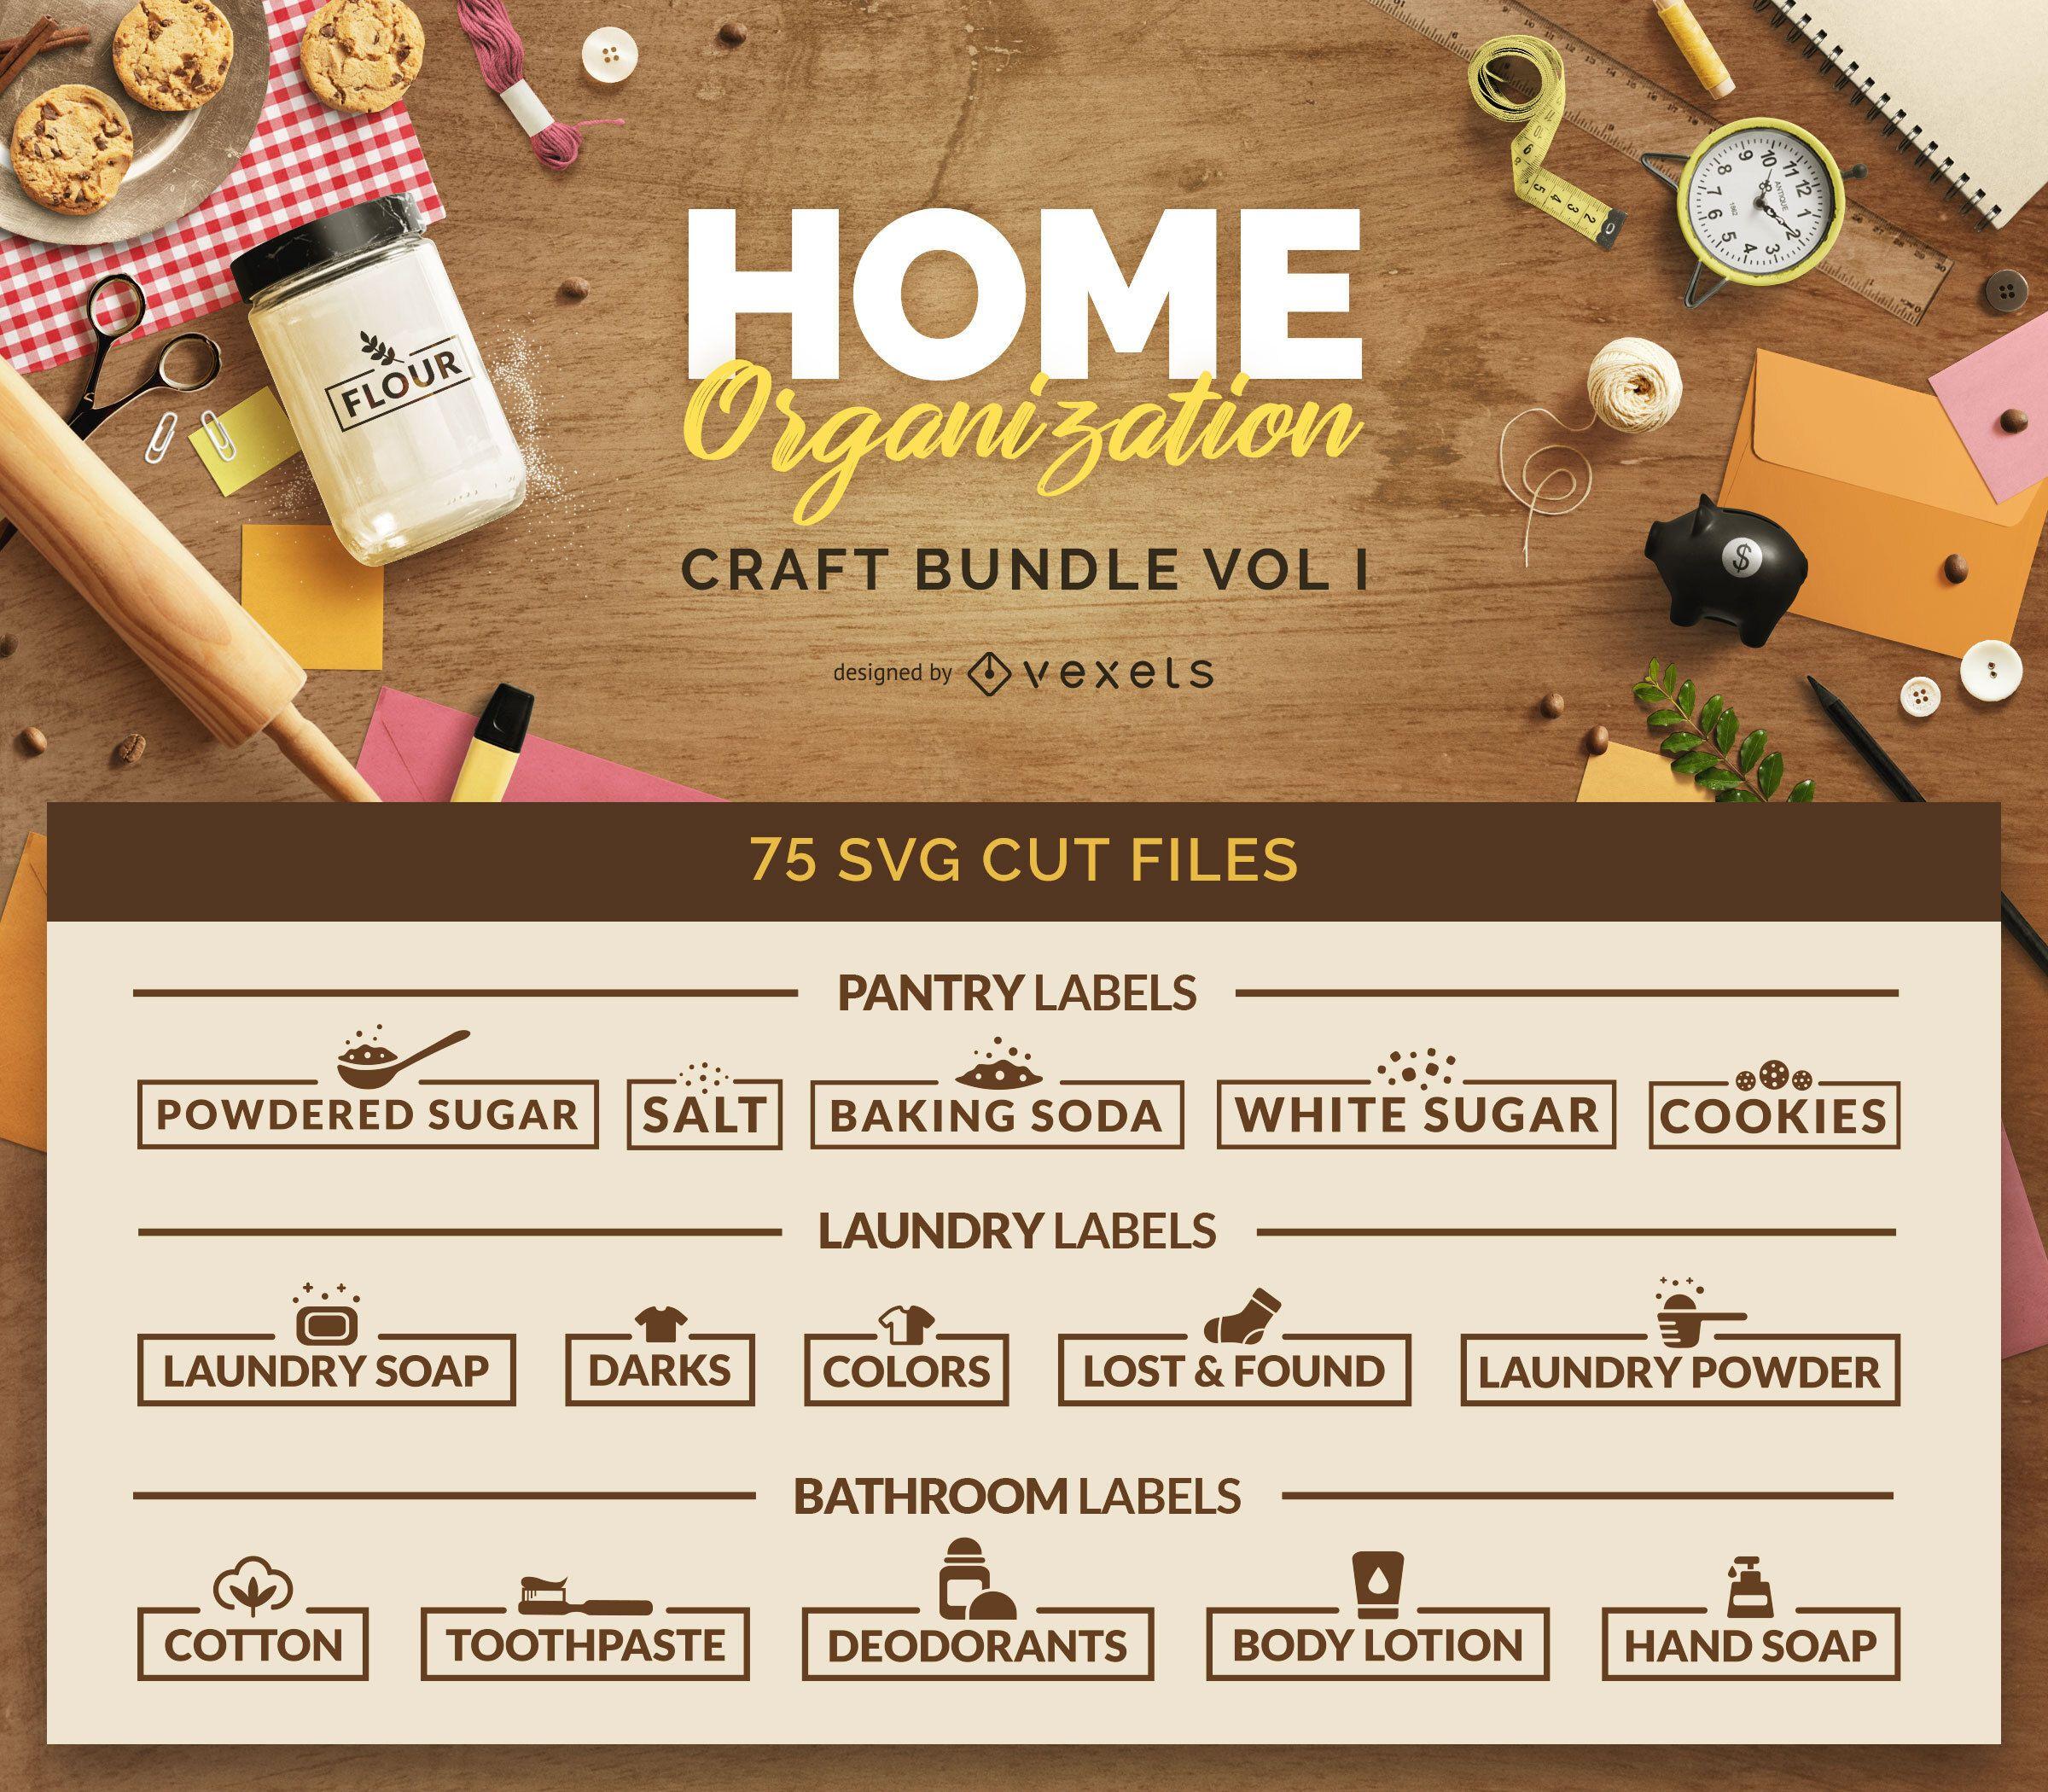 Paquete de manualidades de organización del hogar